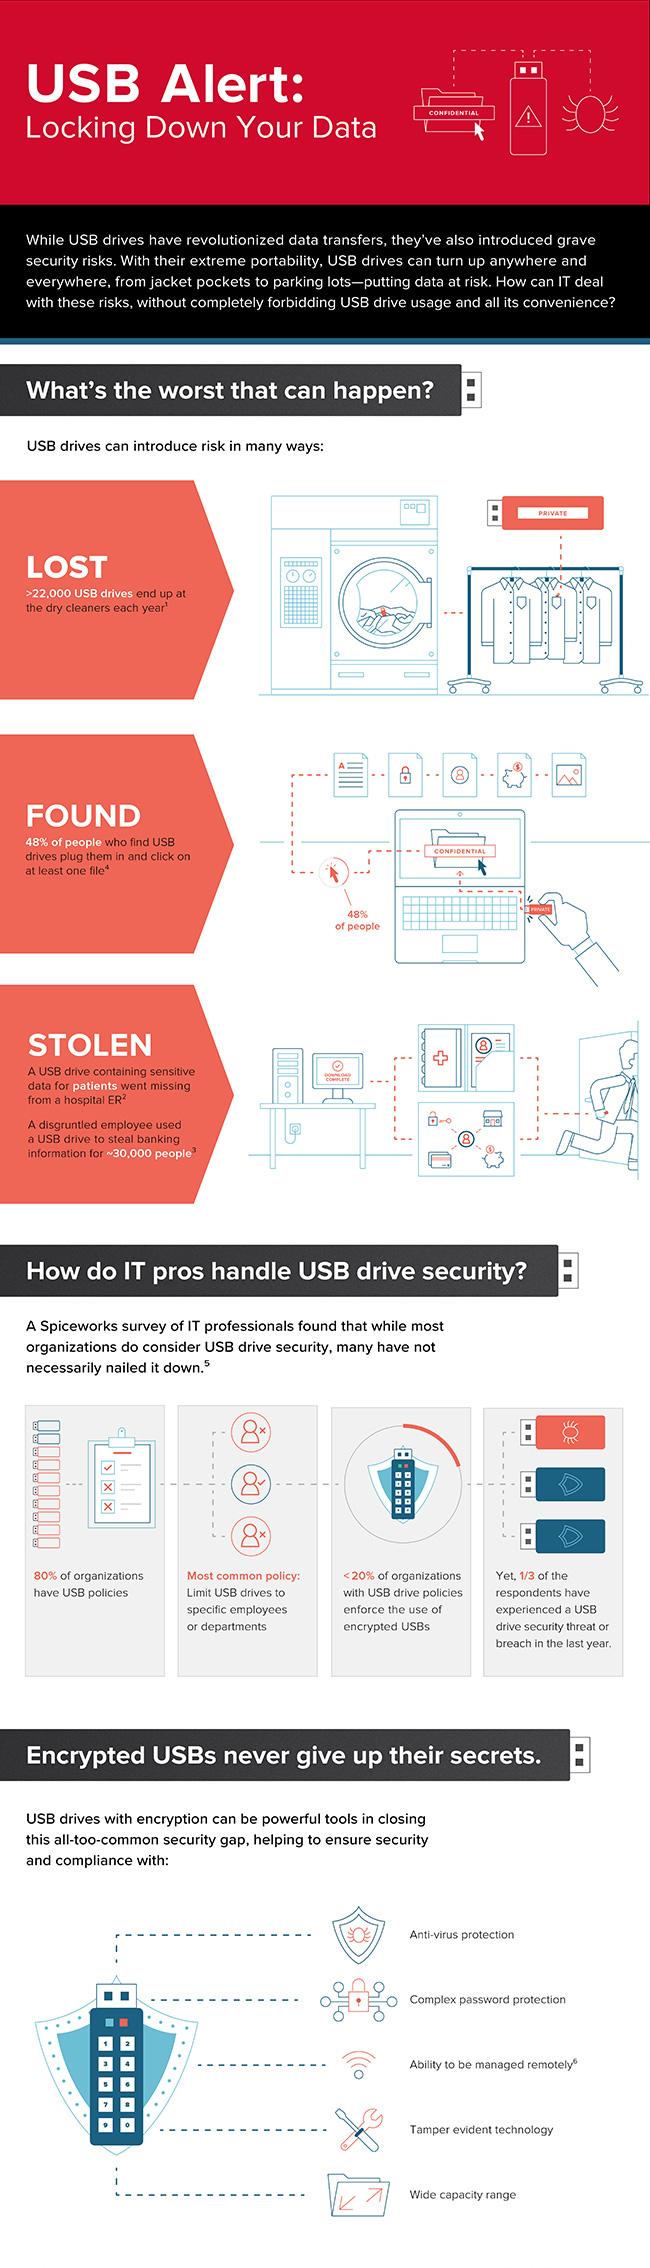 USB Alert: Locking Down Your Data